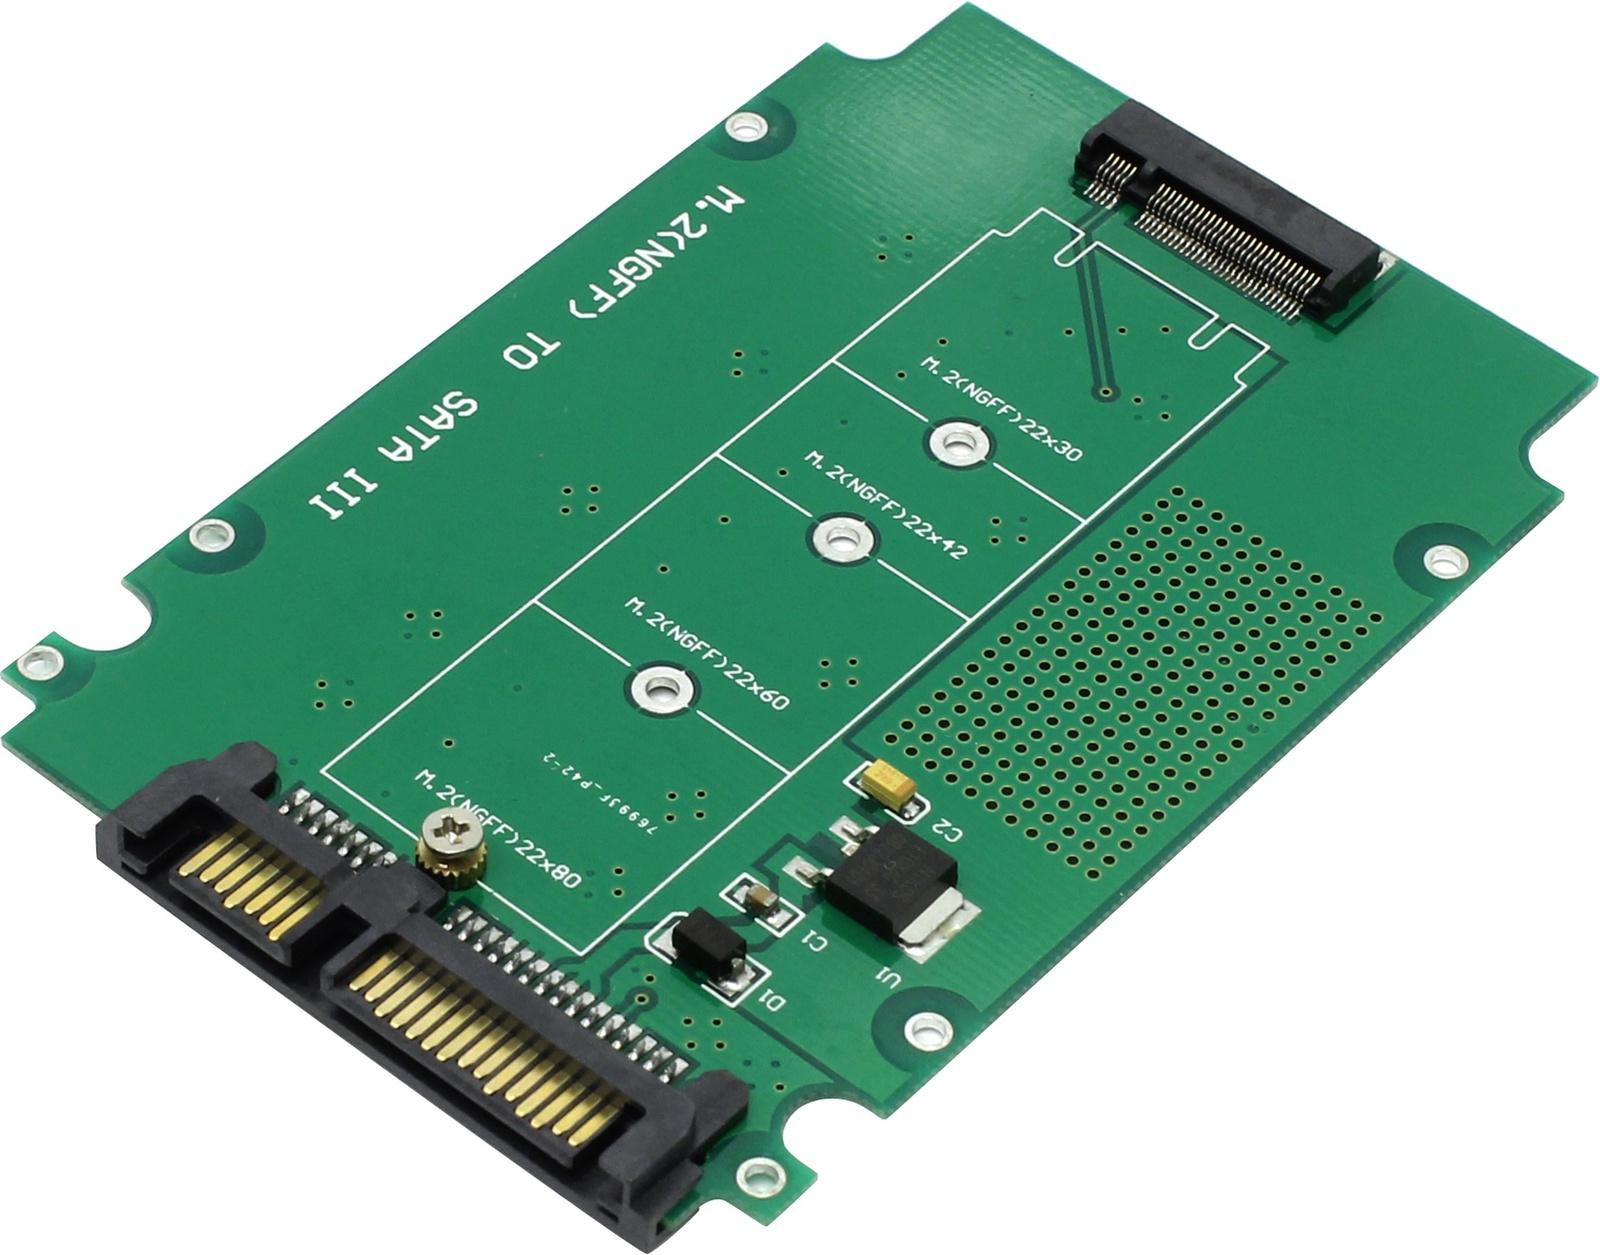 M2S900, Переходник SATA 6G to M.2 (NGFF) ключ B+M, Espada переходник sata 8 pin